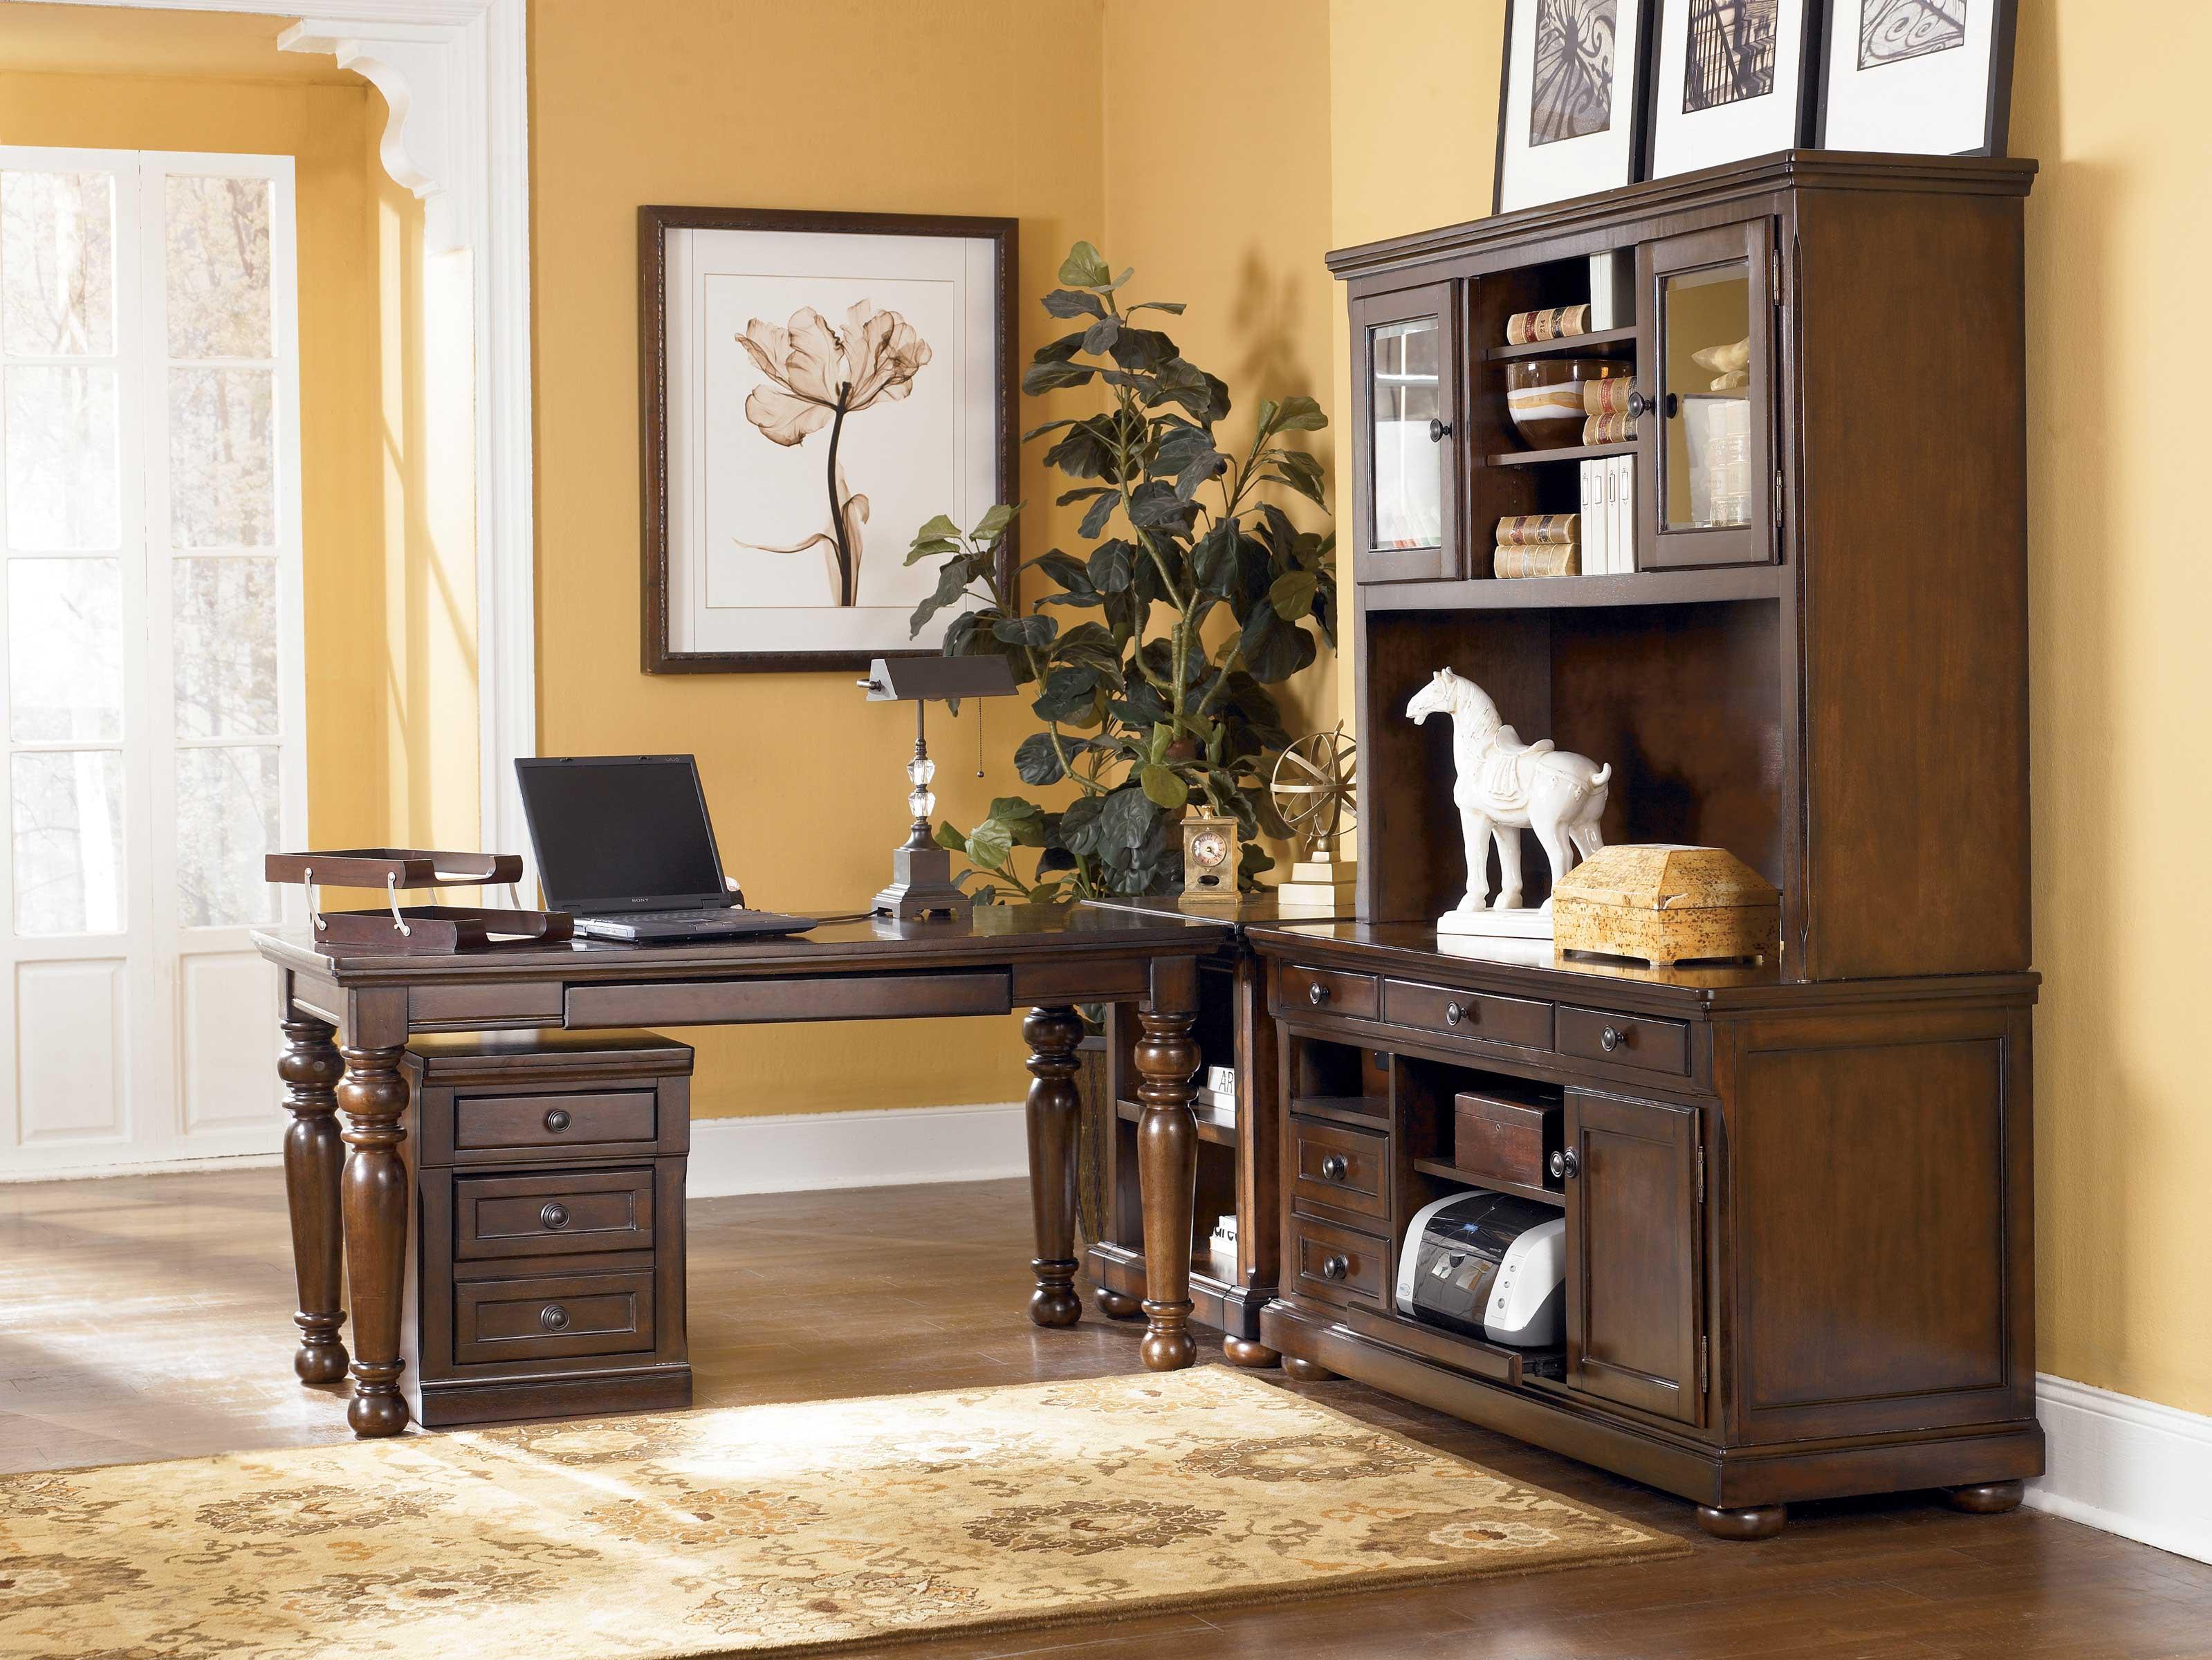 100 Havertys Dining Room Furniture Havertys Bedroom Furnitu